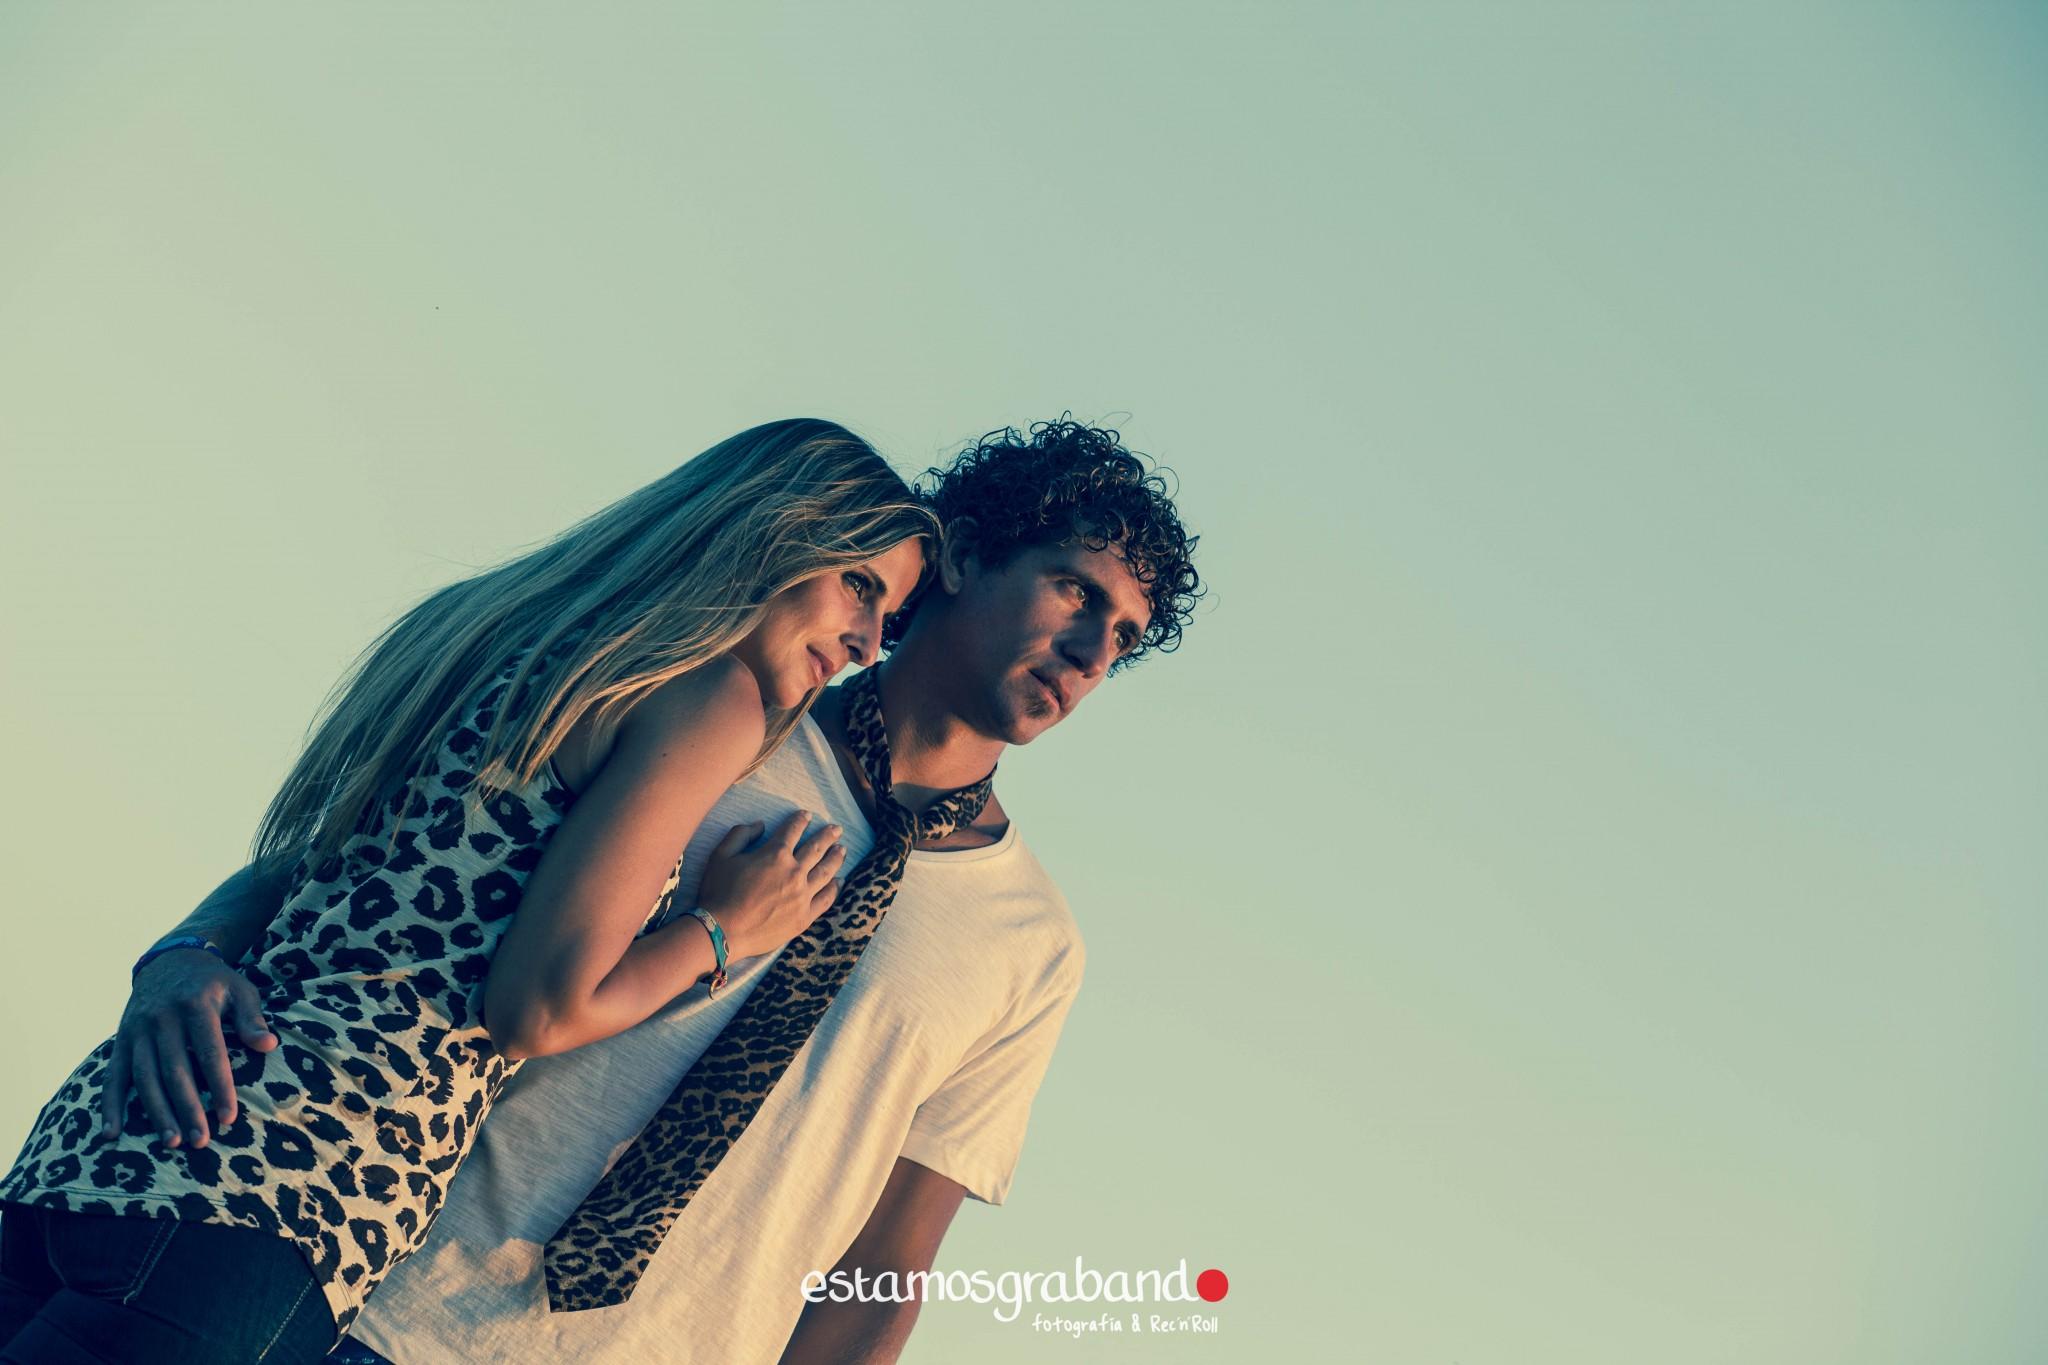 miriam-y-jesucc81s_preboda-blog-20 Surf & Love [Preboda Recandrolera_Miriam & Jesús] - video boda cadiz